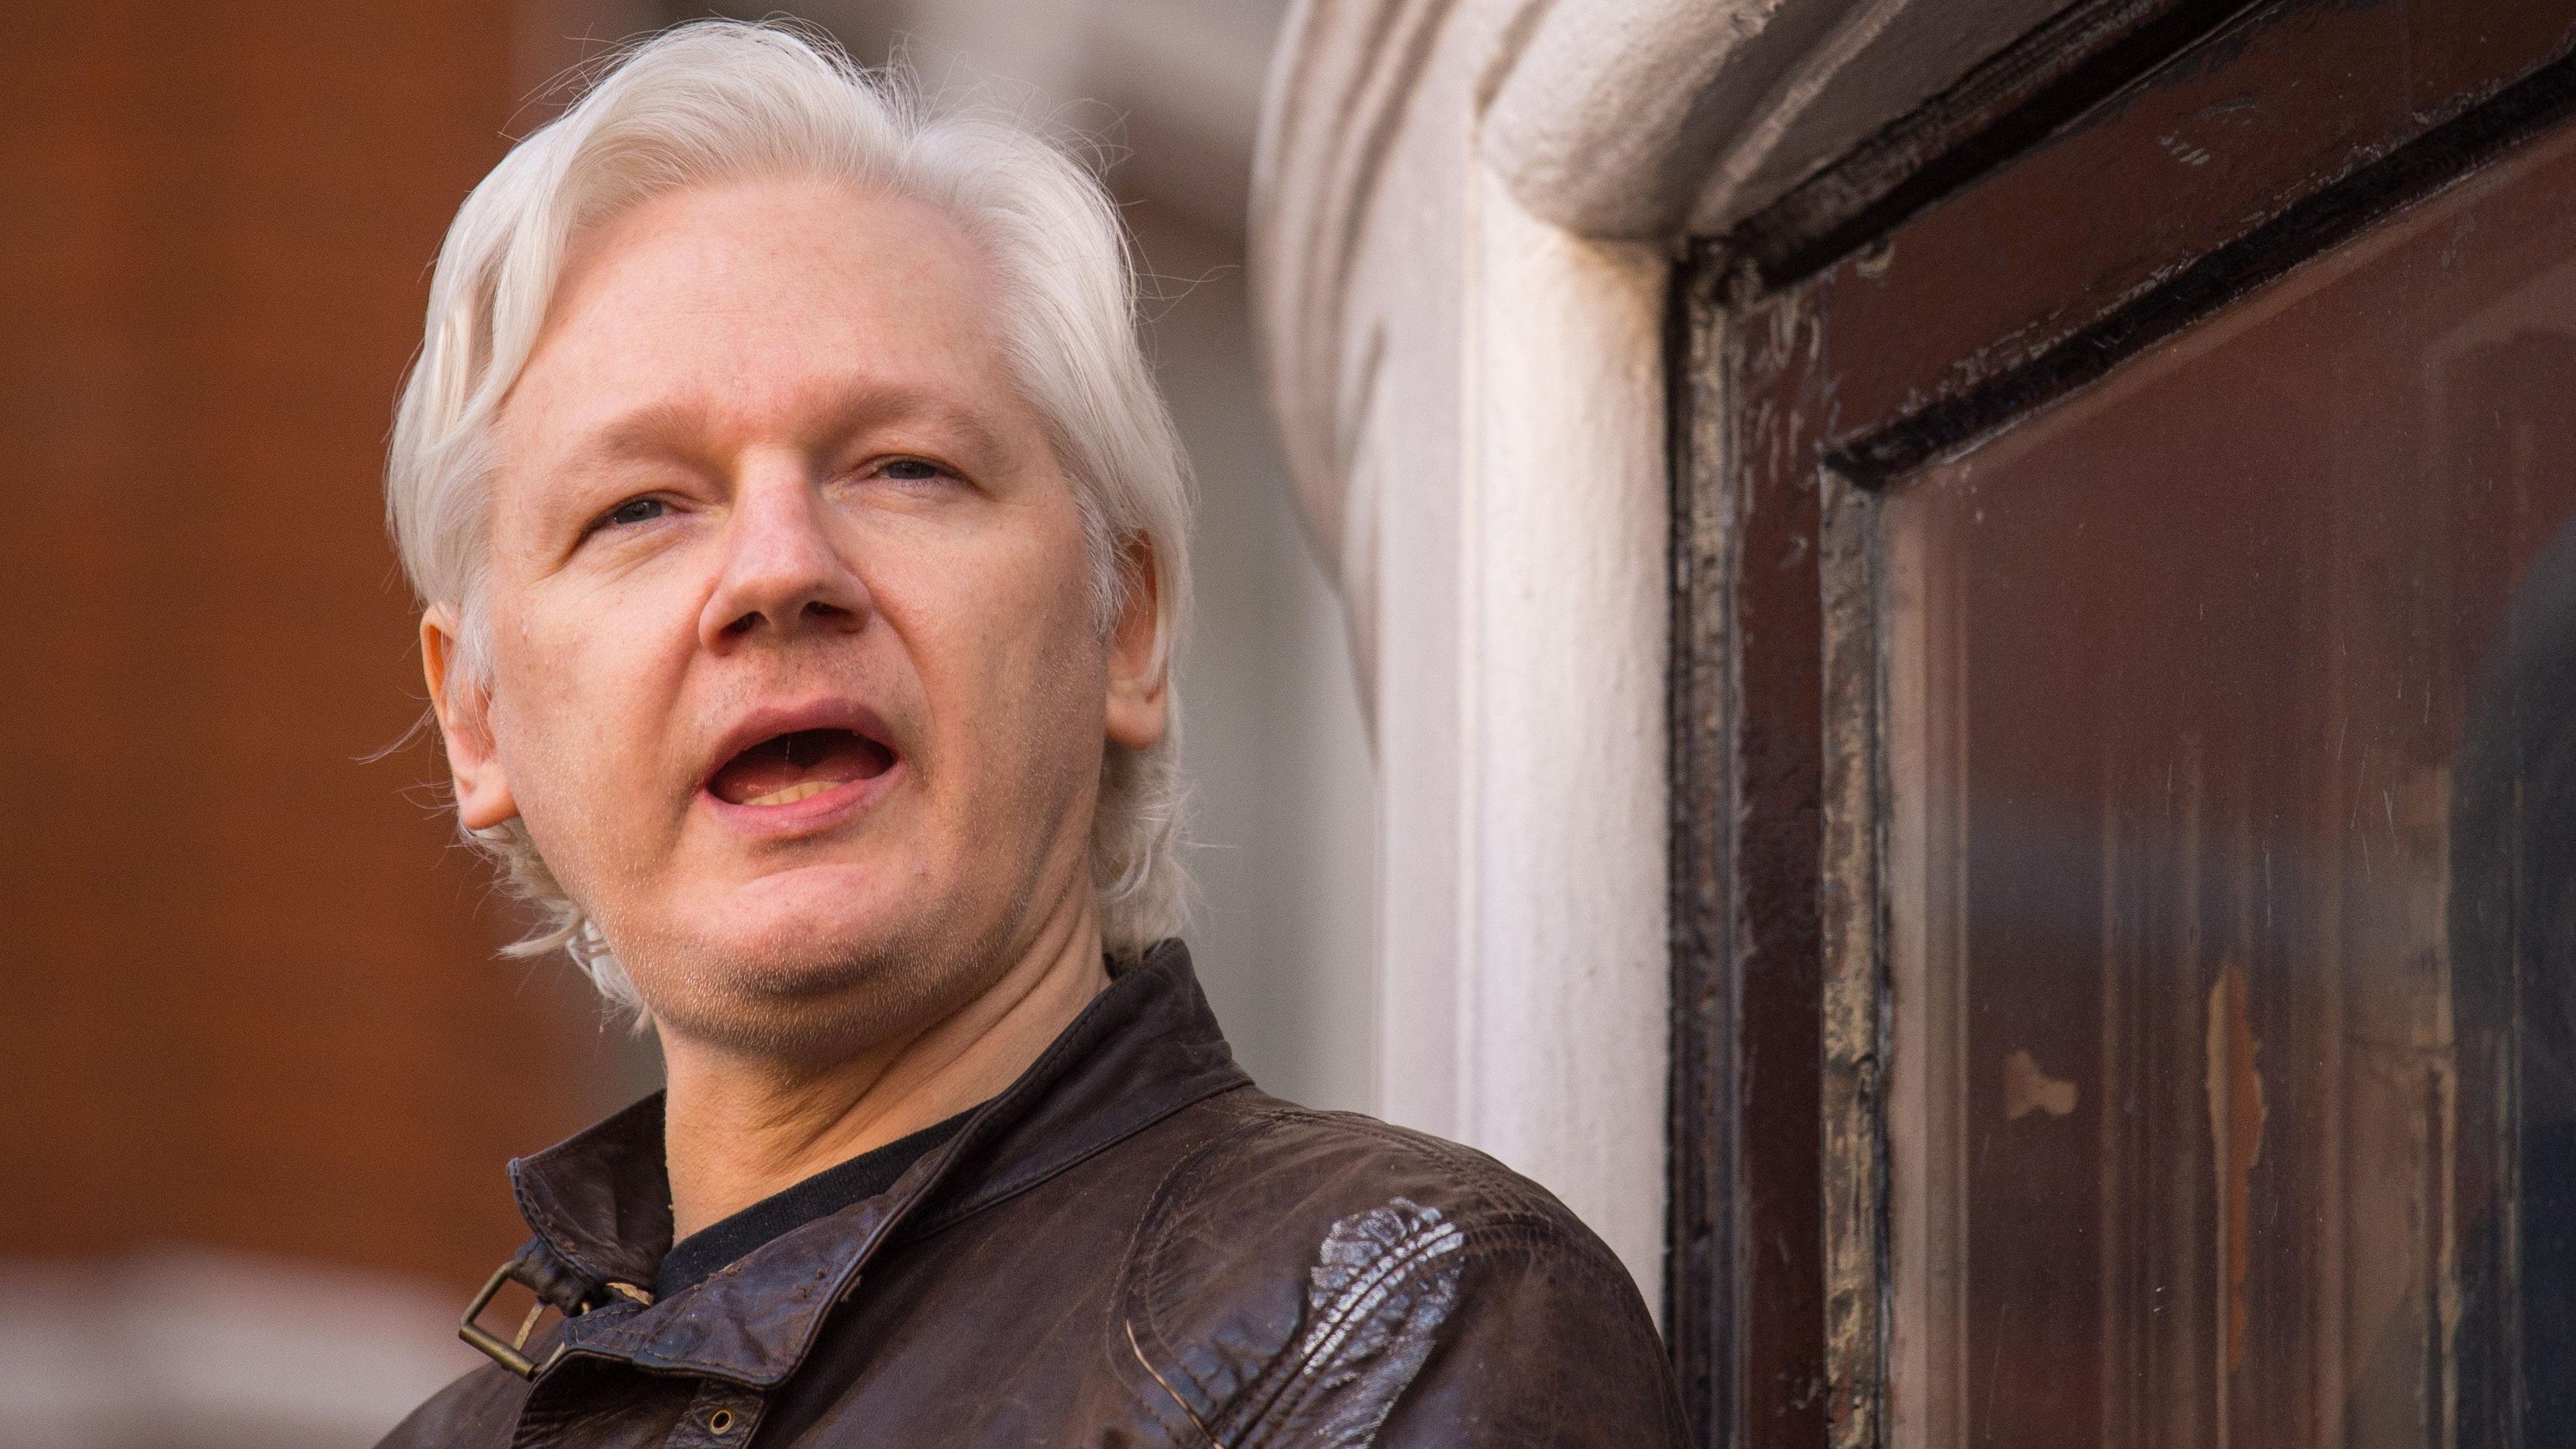 Ecuadorean Embassy Cuts Off Julian Assange's Internet Access